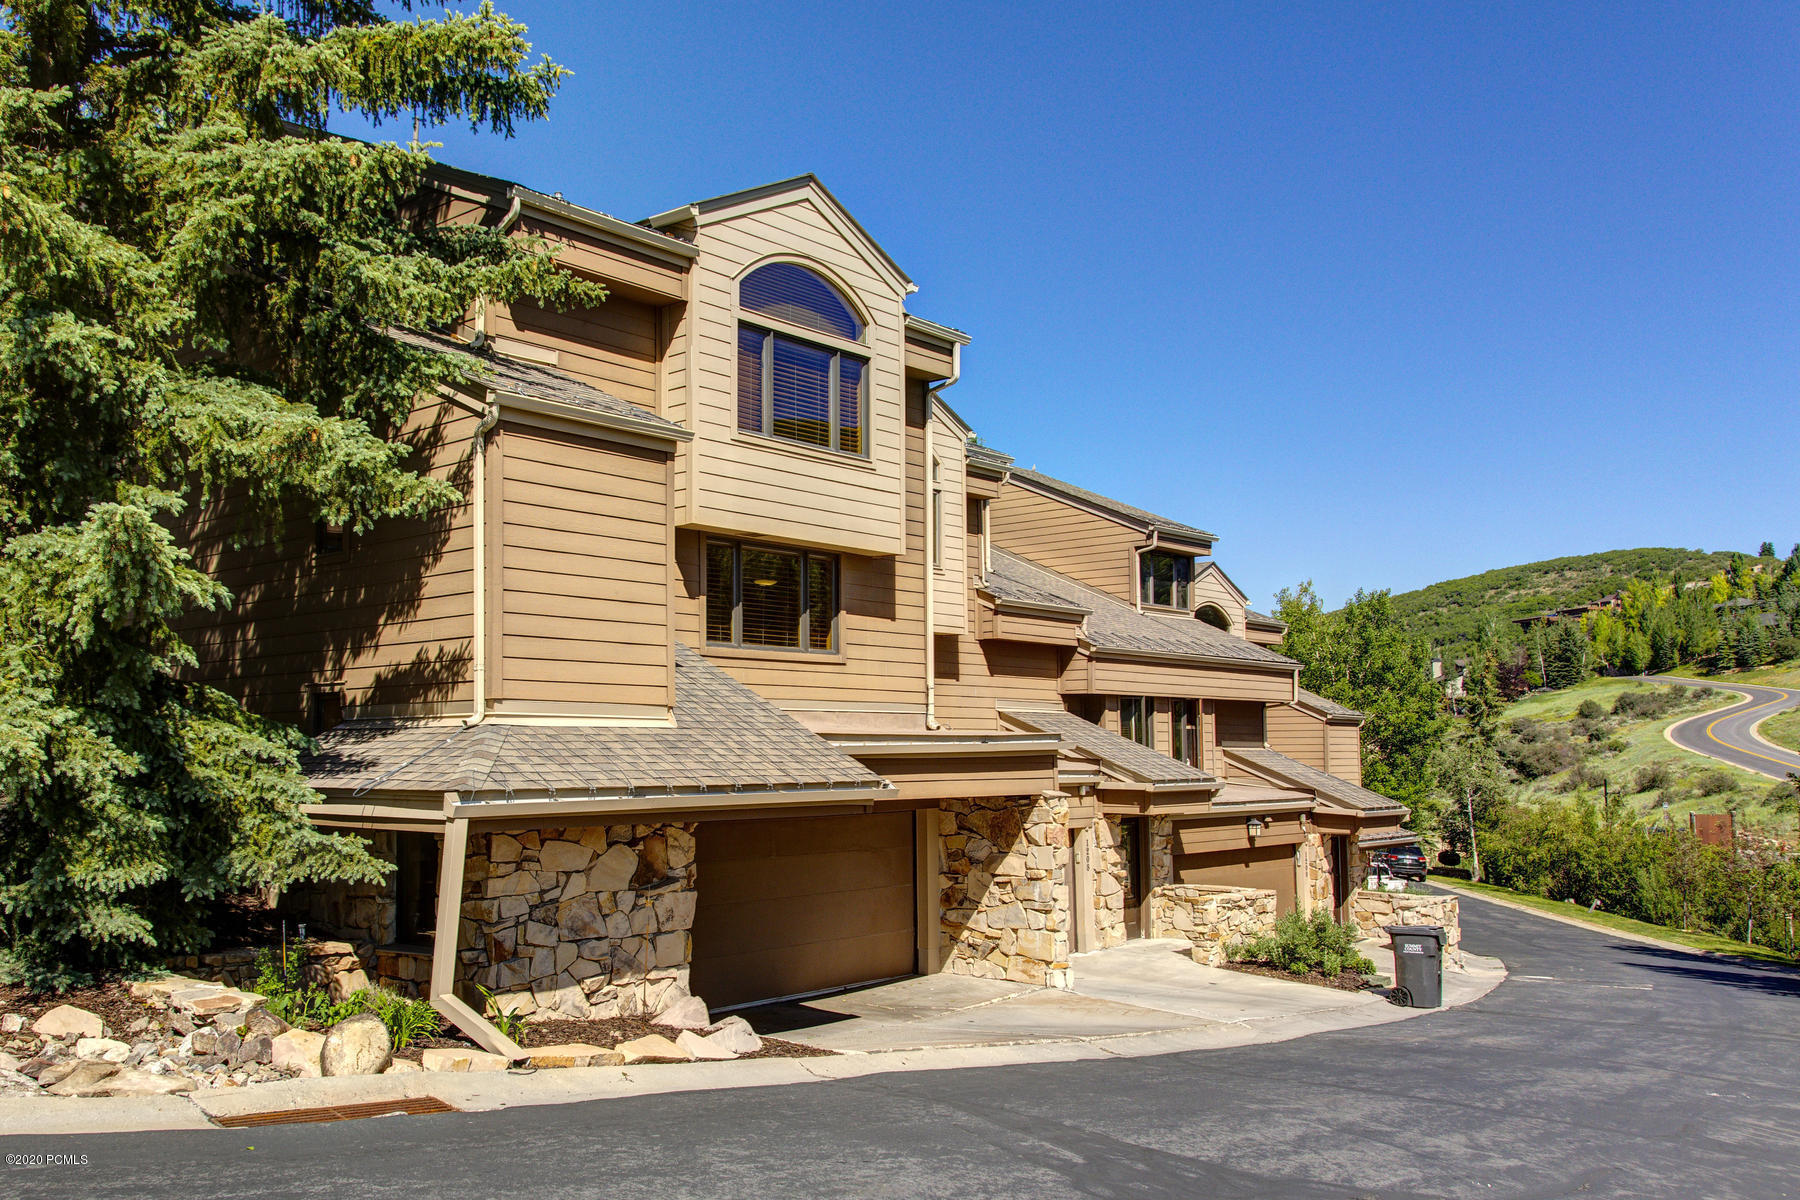 1216 Stonebridge Circle, Park City, Utah 84060, 3 Bedrooms Bedrooms, ,3 BathroomsBathrooms,Condominium,For Sale,Stonebridge,20190109112430415765000000